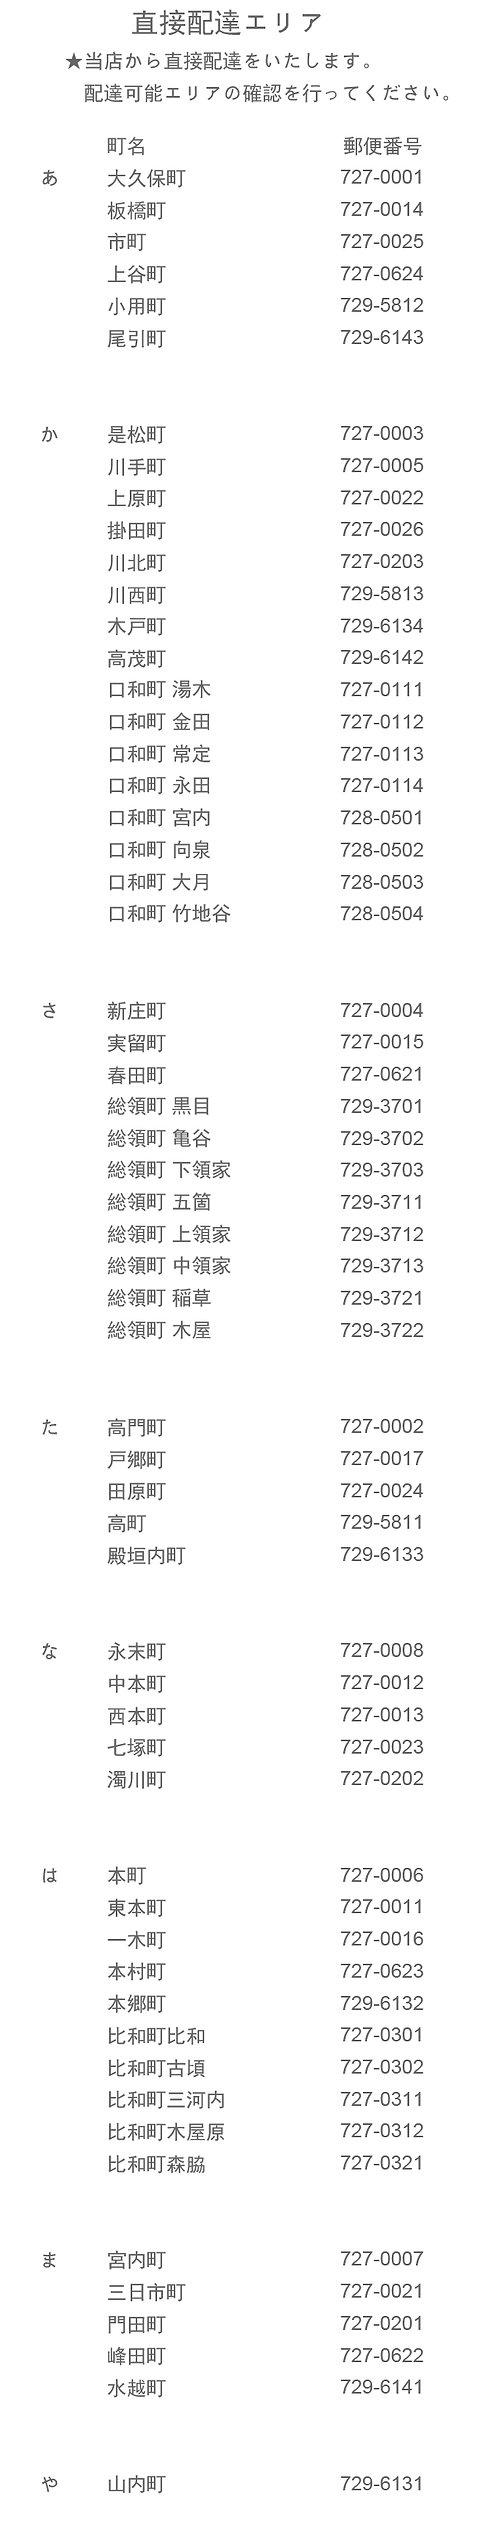 visit用配達エリア表.jpg